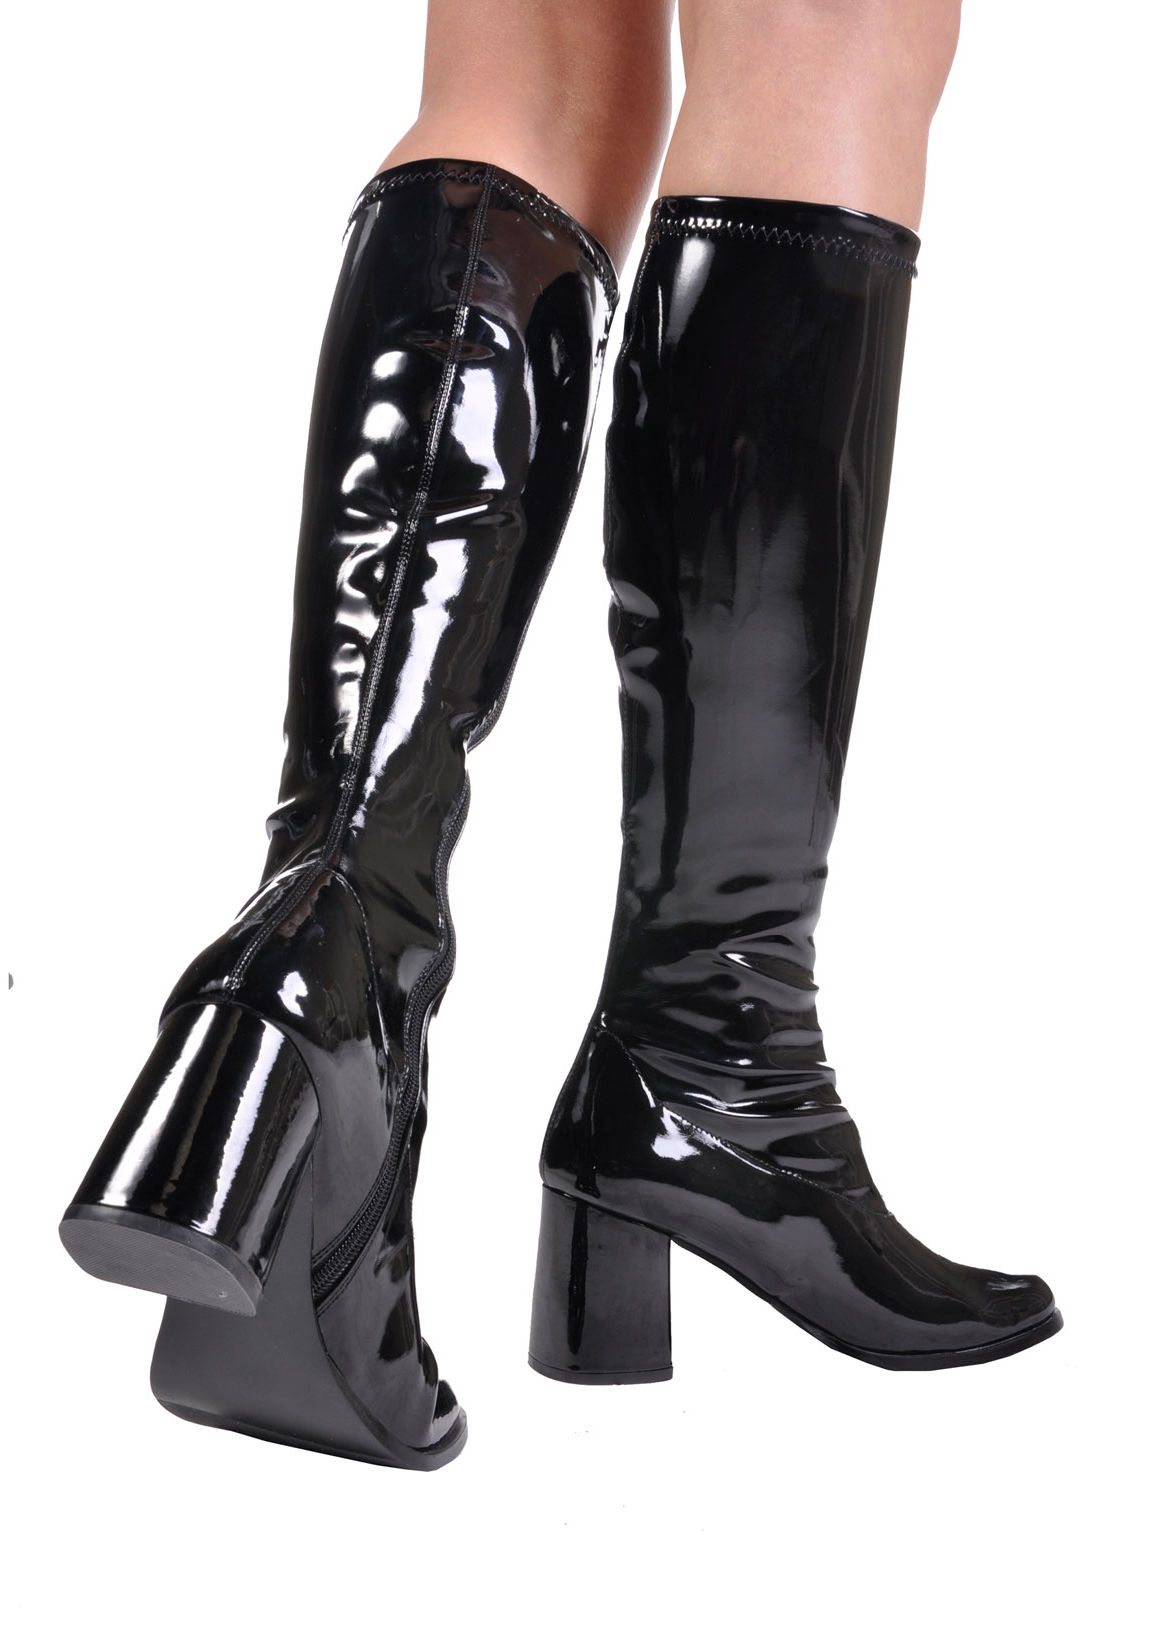 pleaser gogo 300 3 inch block heel gogo boots side zipper